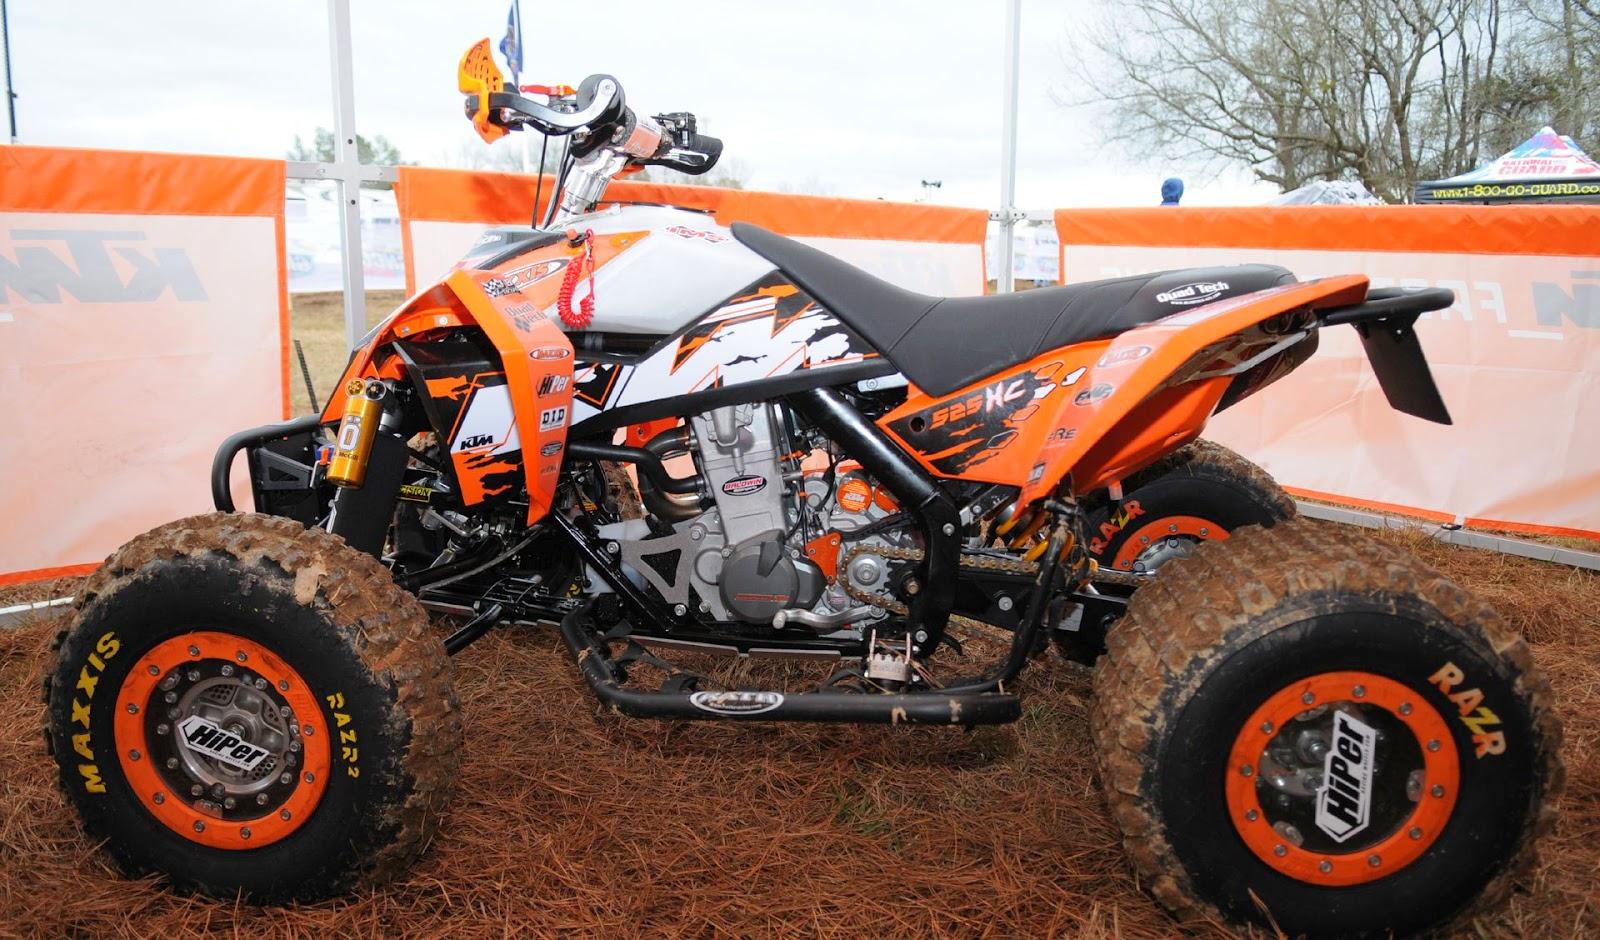 KTM 525 XC ATV Sports Bikes HD Images